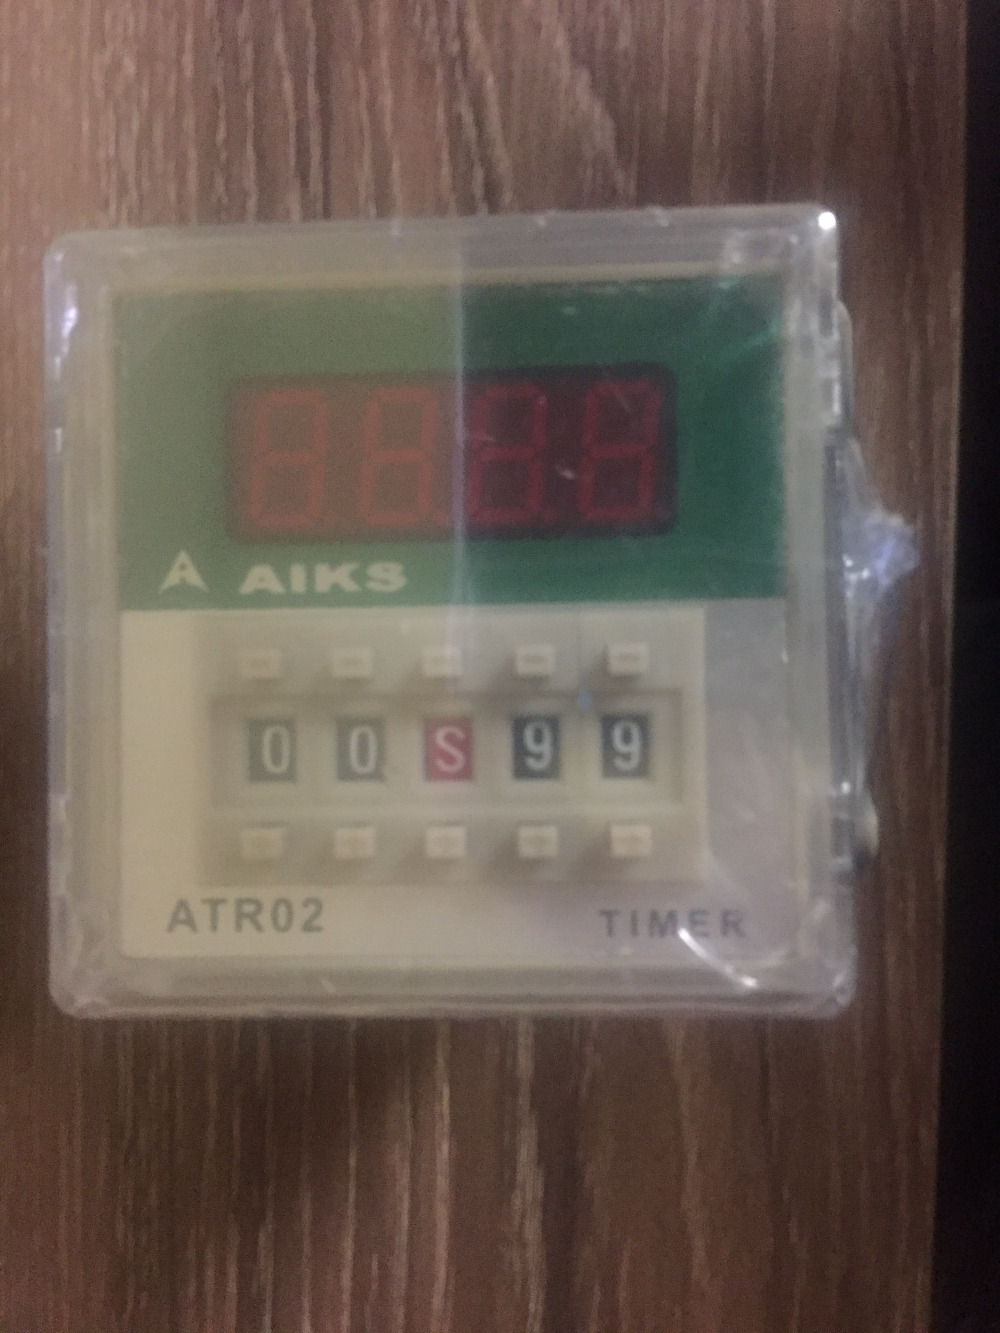 AIKS AUX time relay ATR02-B2 AC220V perfect alternative DH48S genuine taiwan research anv time relay ah2 yb ac220v